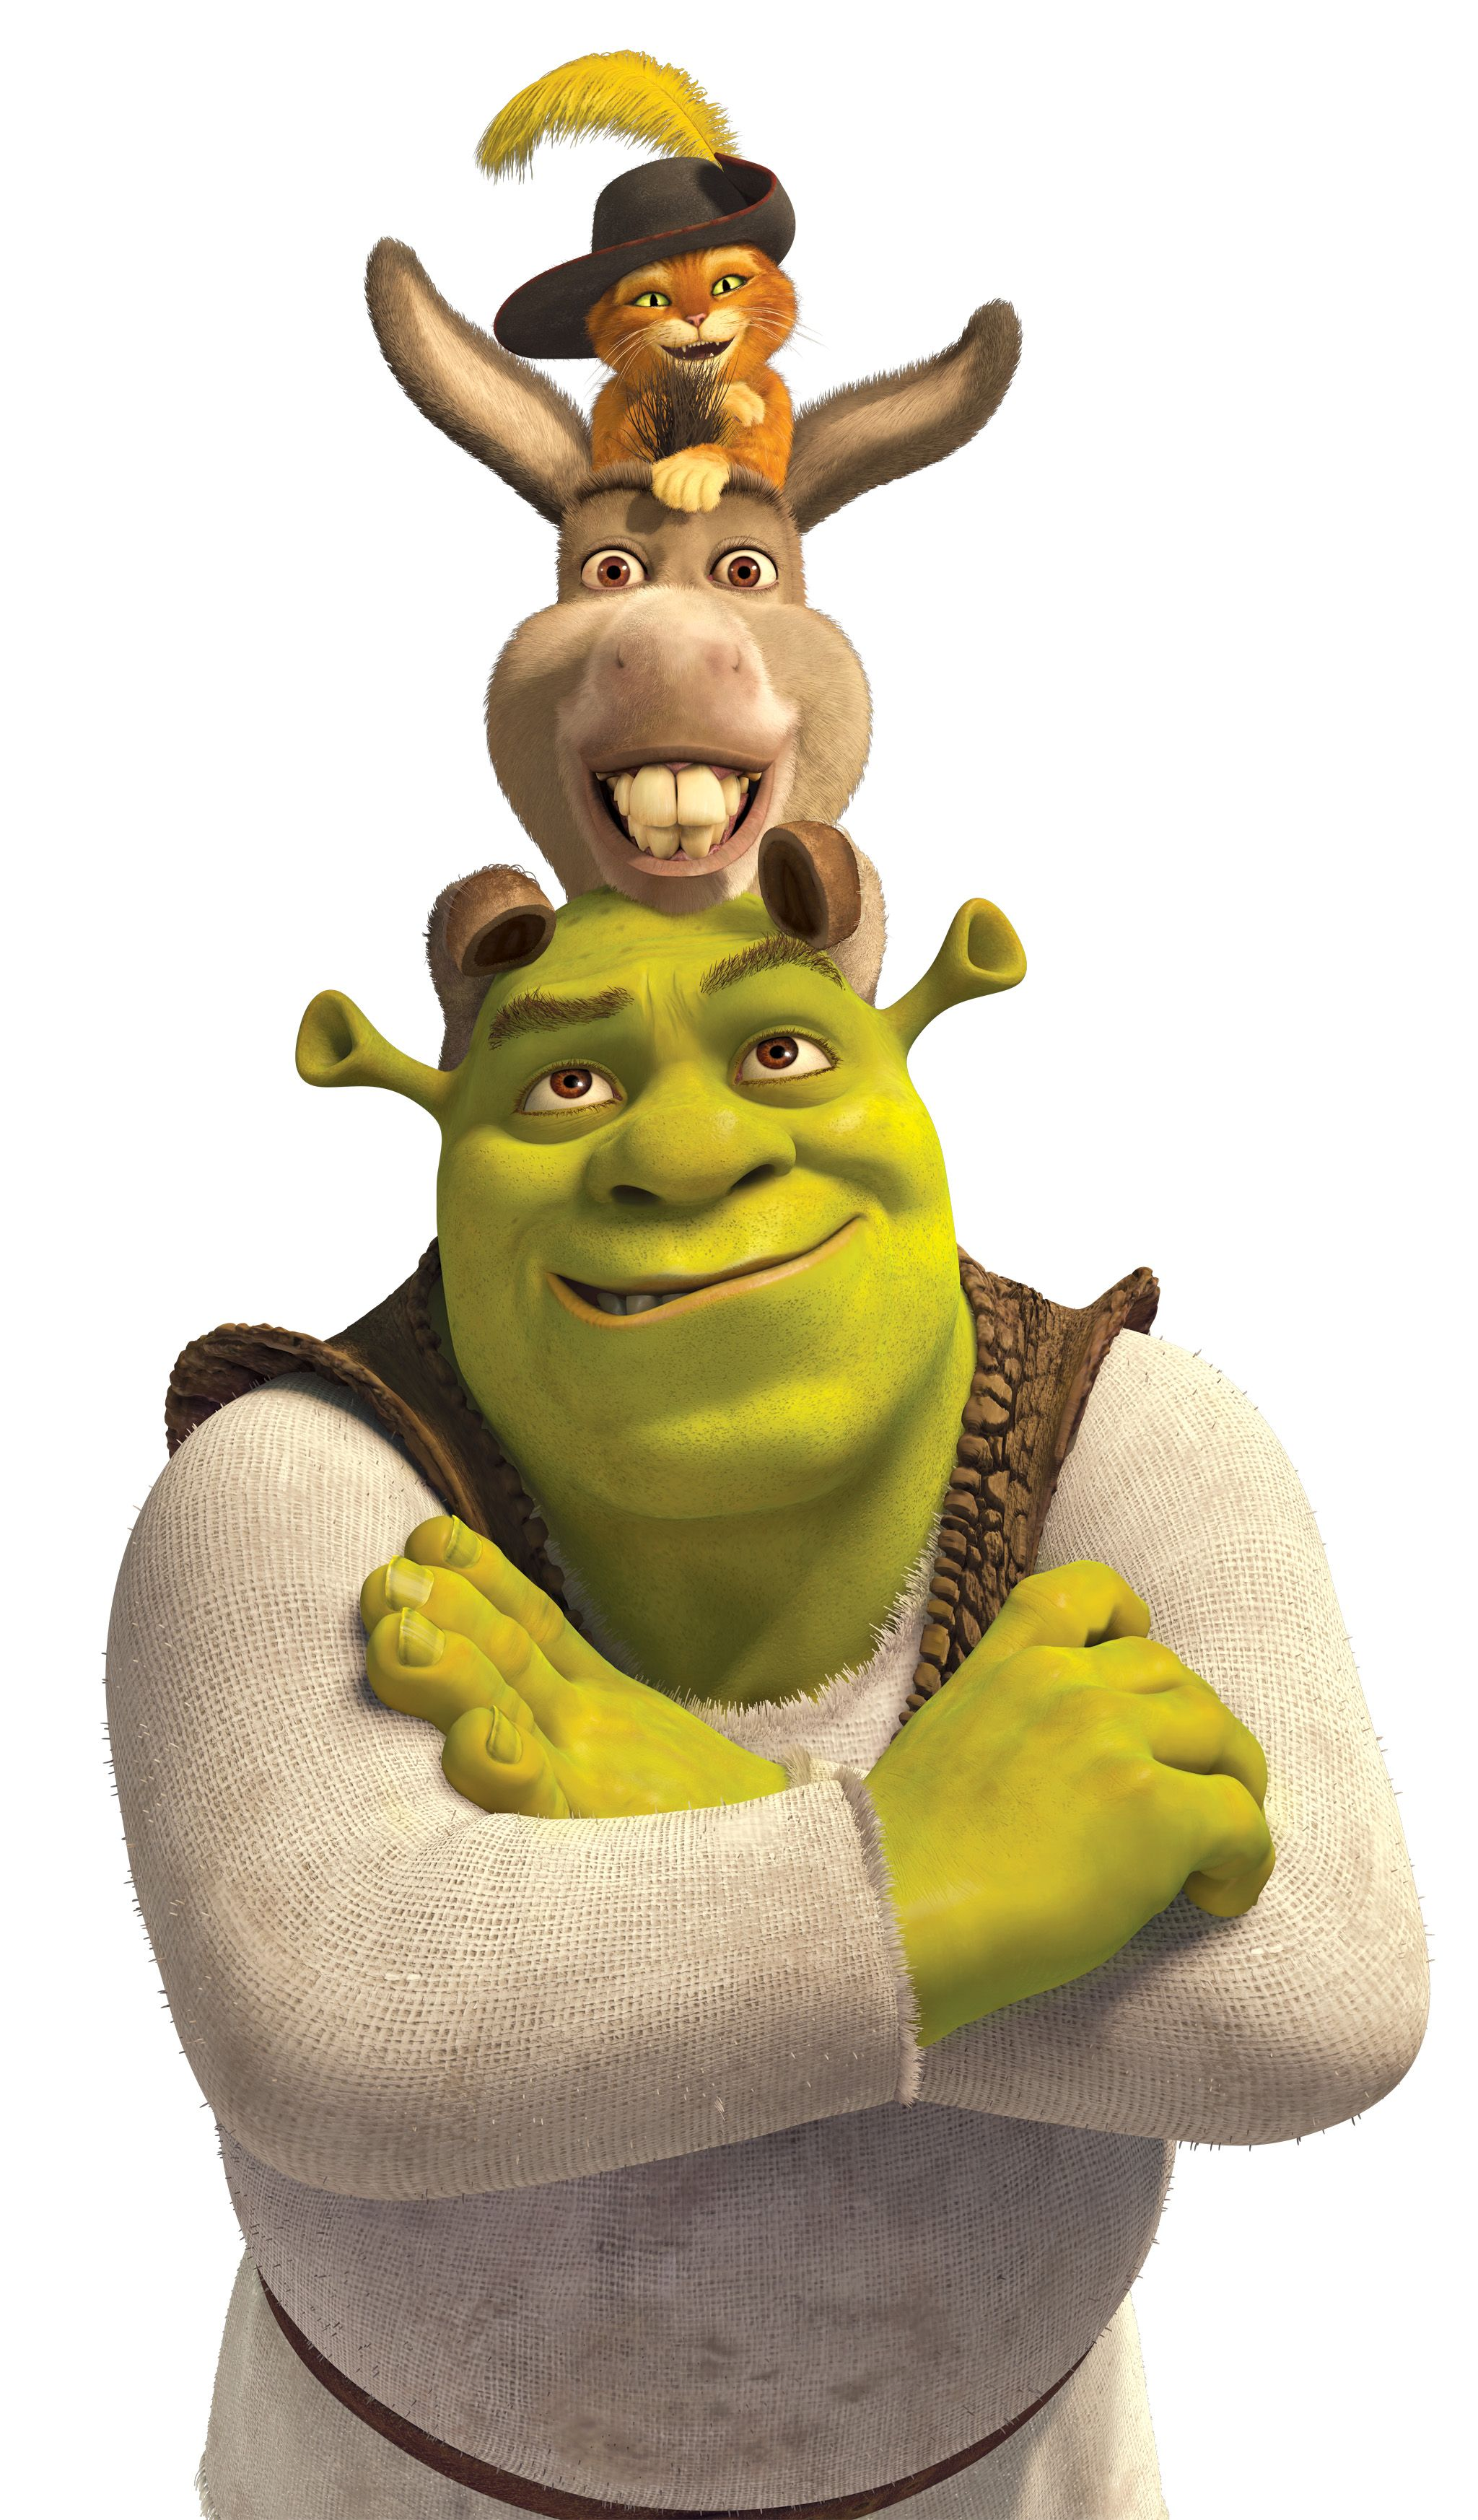 Gato, Burro y Shrek. FAMOSOS DE A COLOR. Pinterest